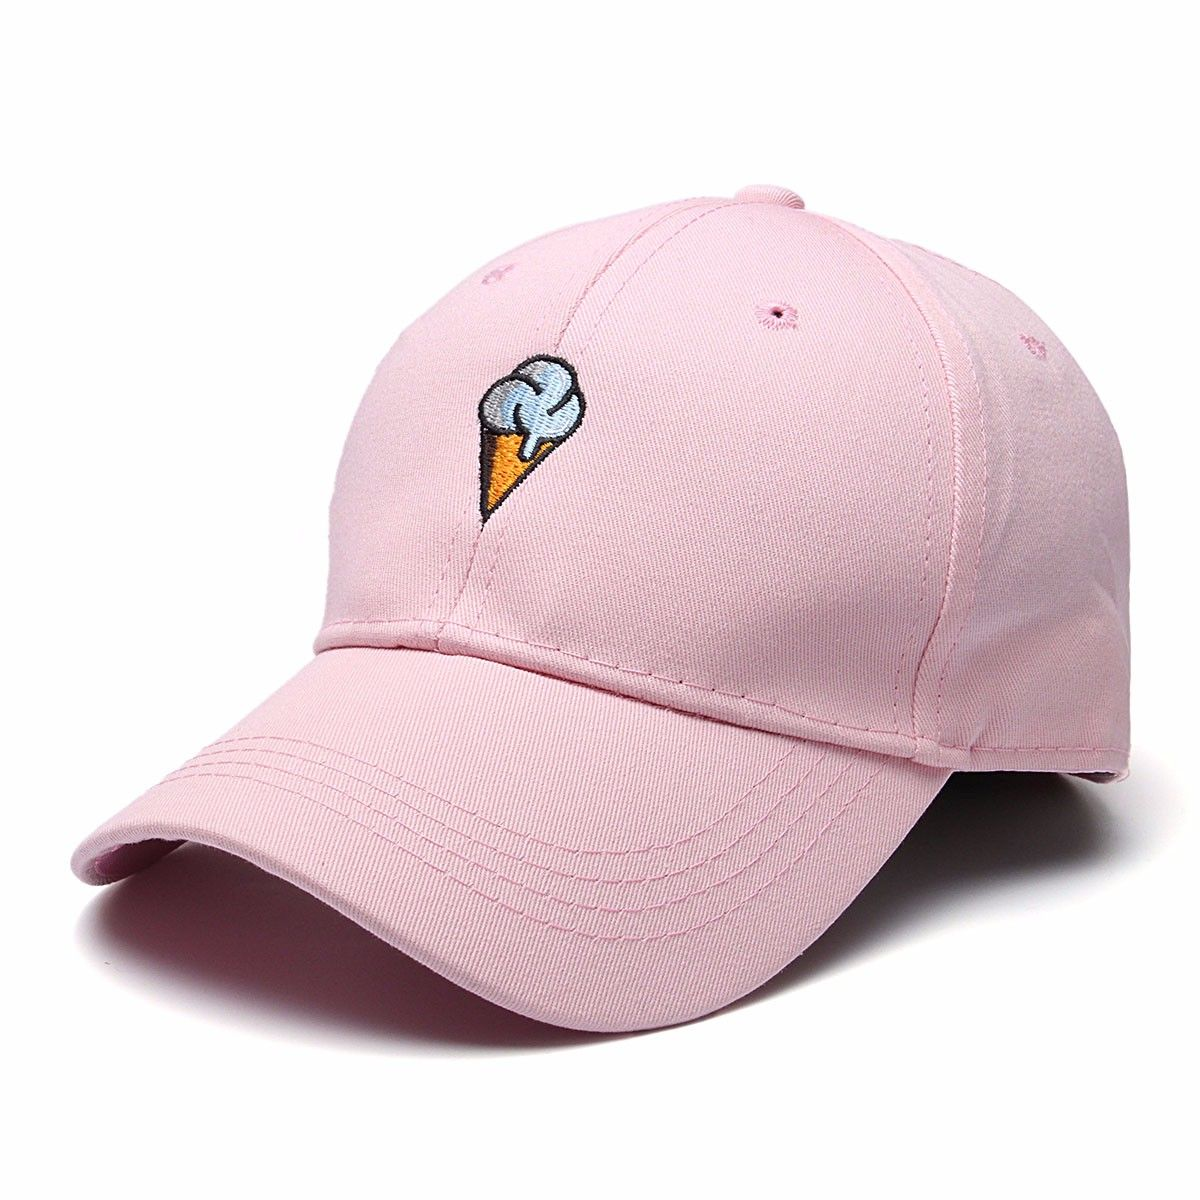 4c8d7744b8eb82 Women Cotton Ice Cream Embroidery Sport Men Hip-hop Cap Strap Back Trucker Baseball  Hat #accessories #women #clothes #trend #moda #fashion #jewelry